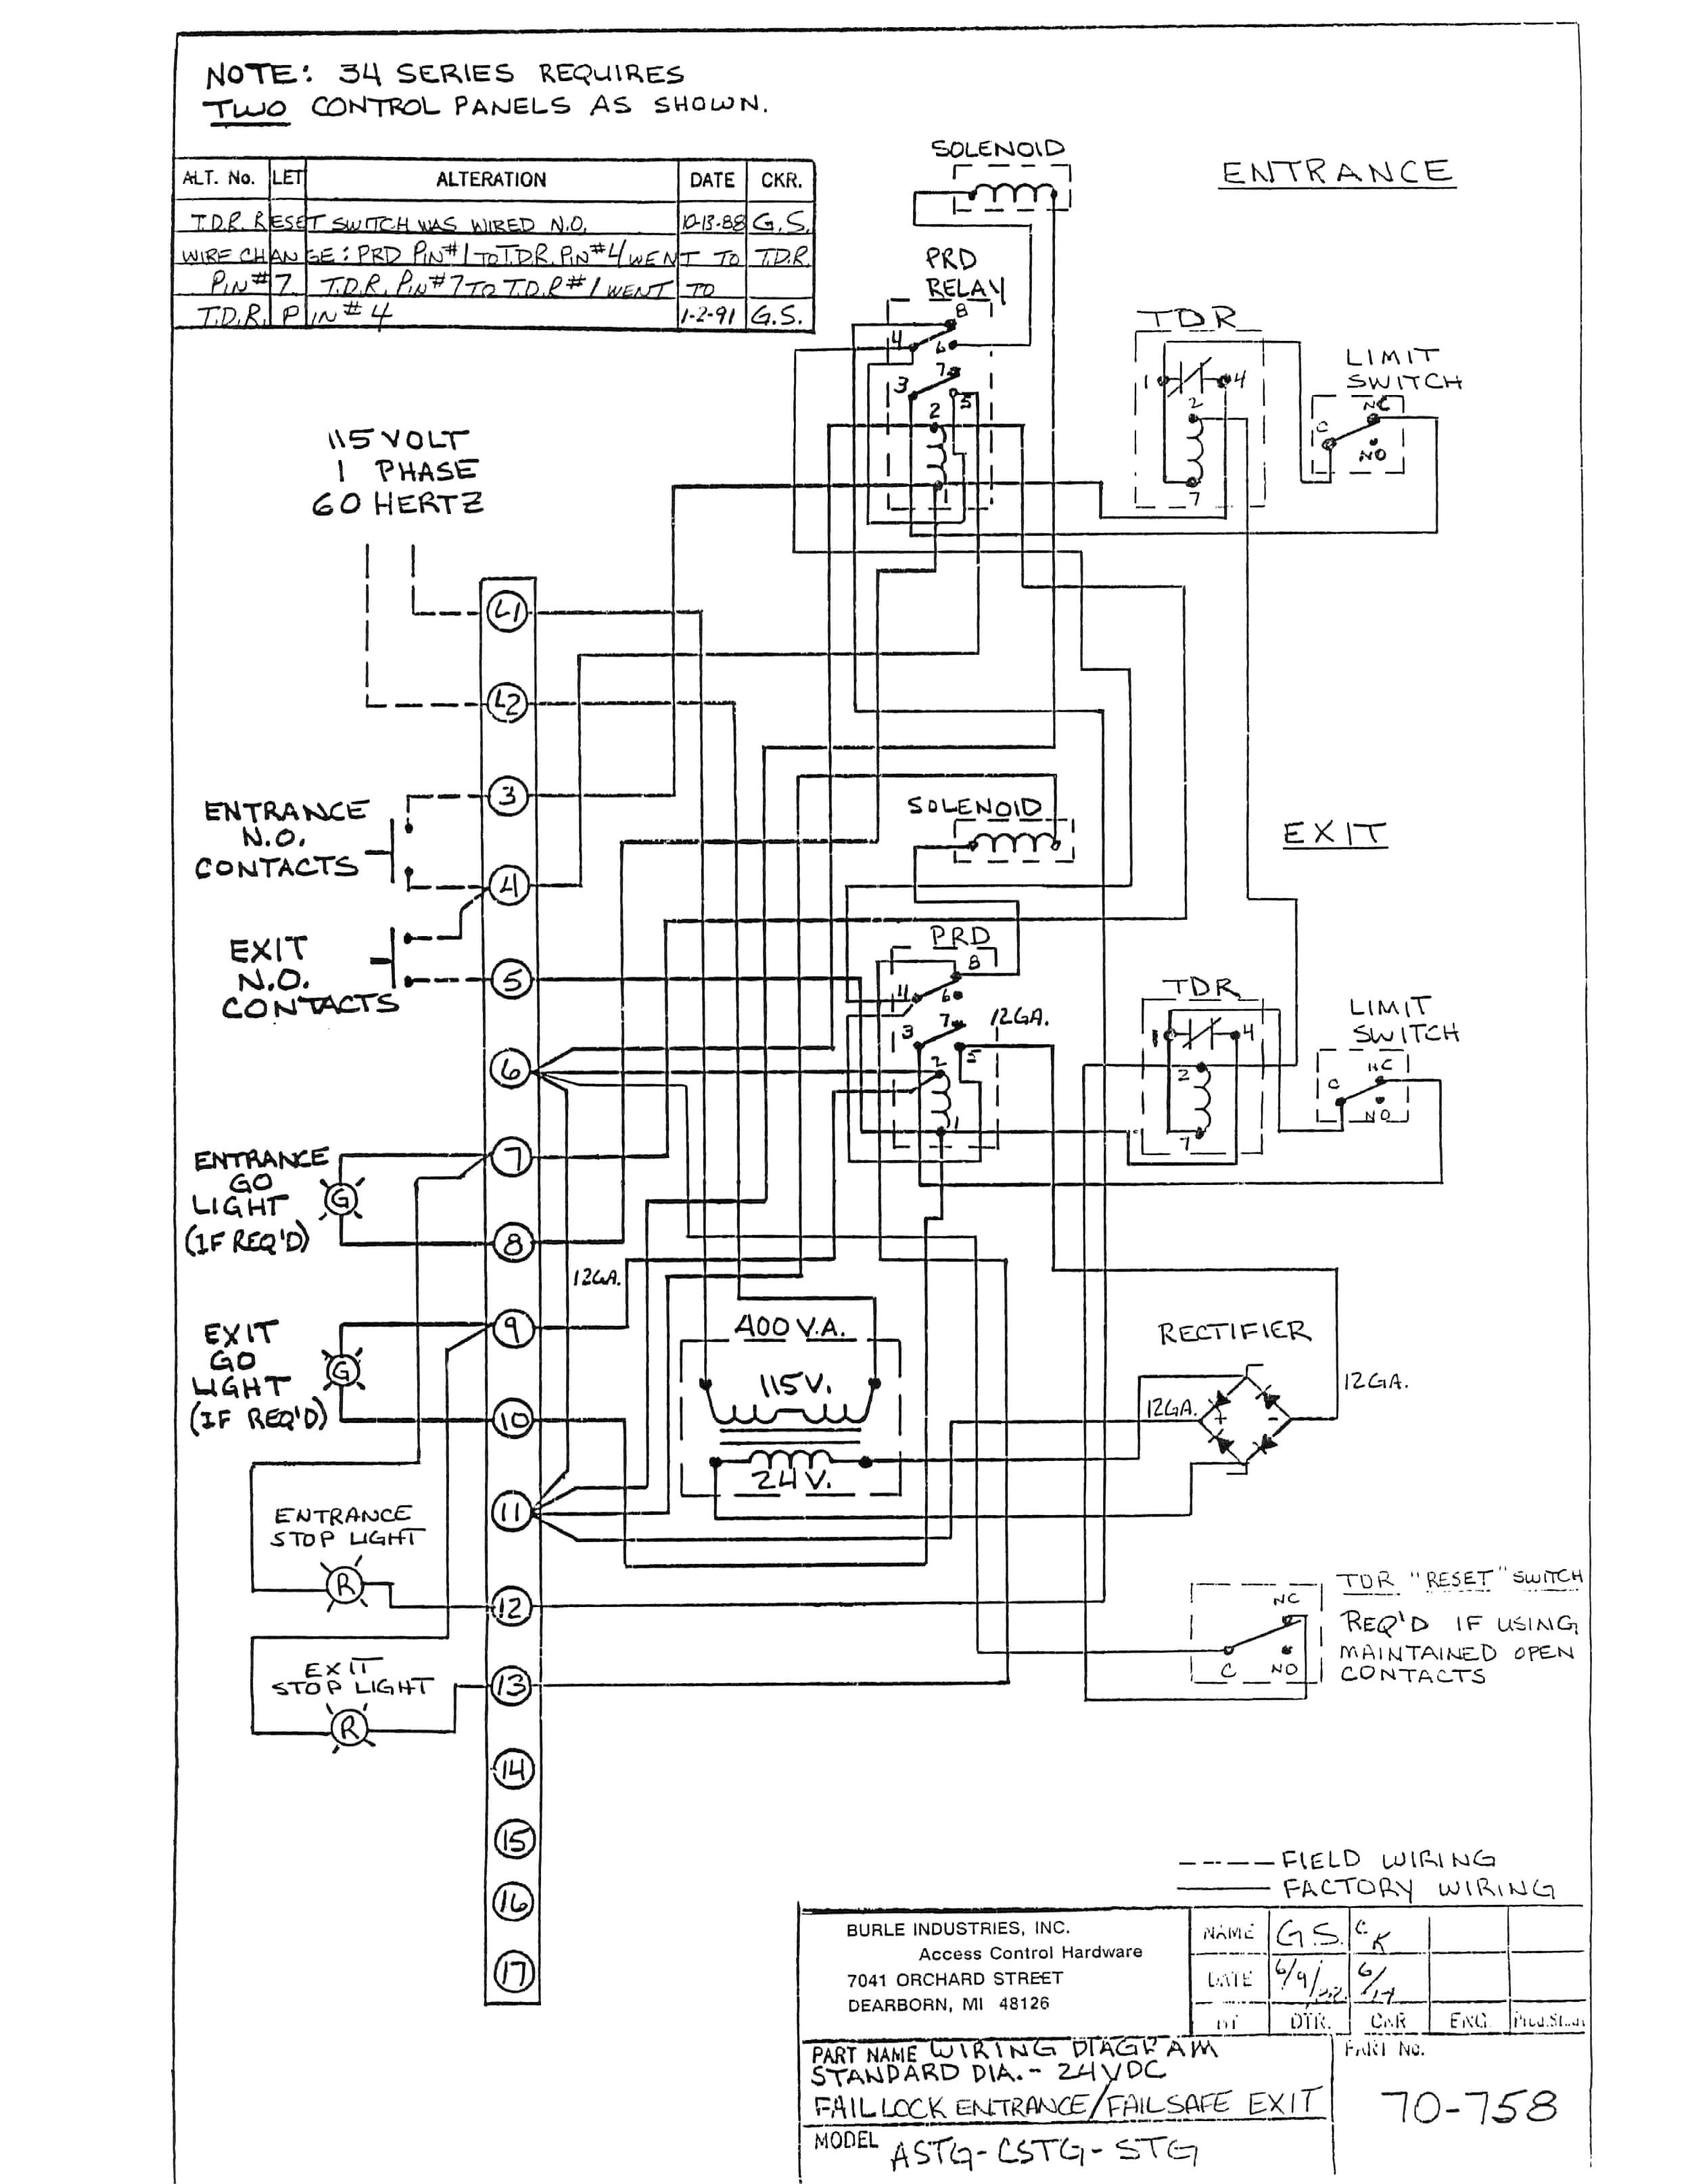 Trane Rooftop Unit Wiring Diagram